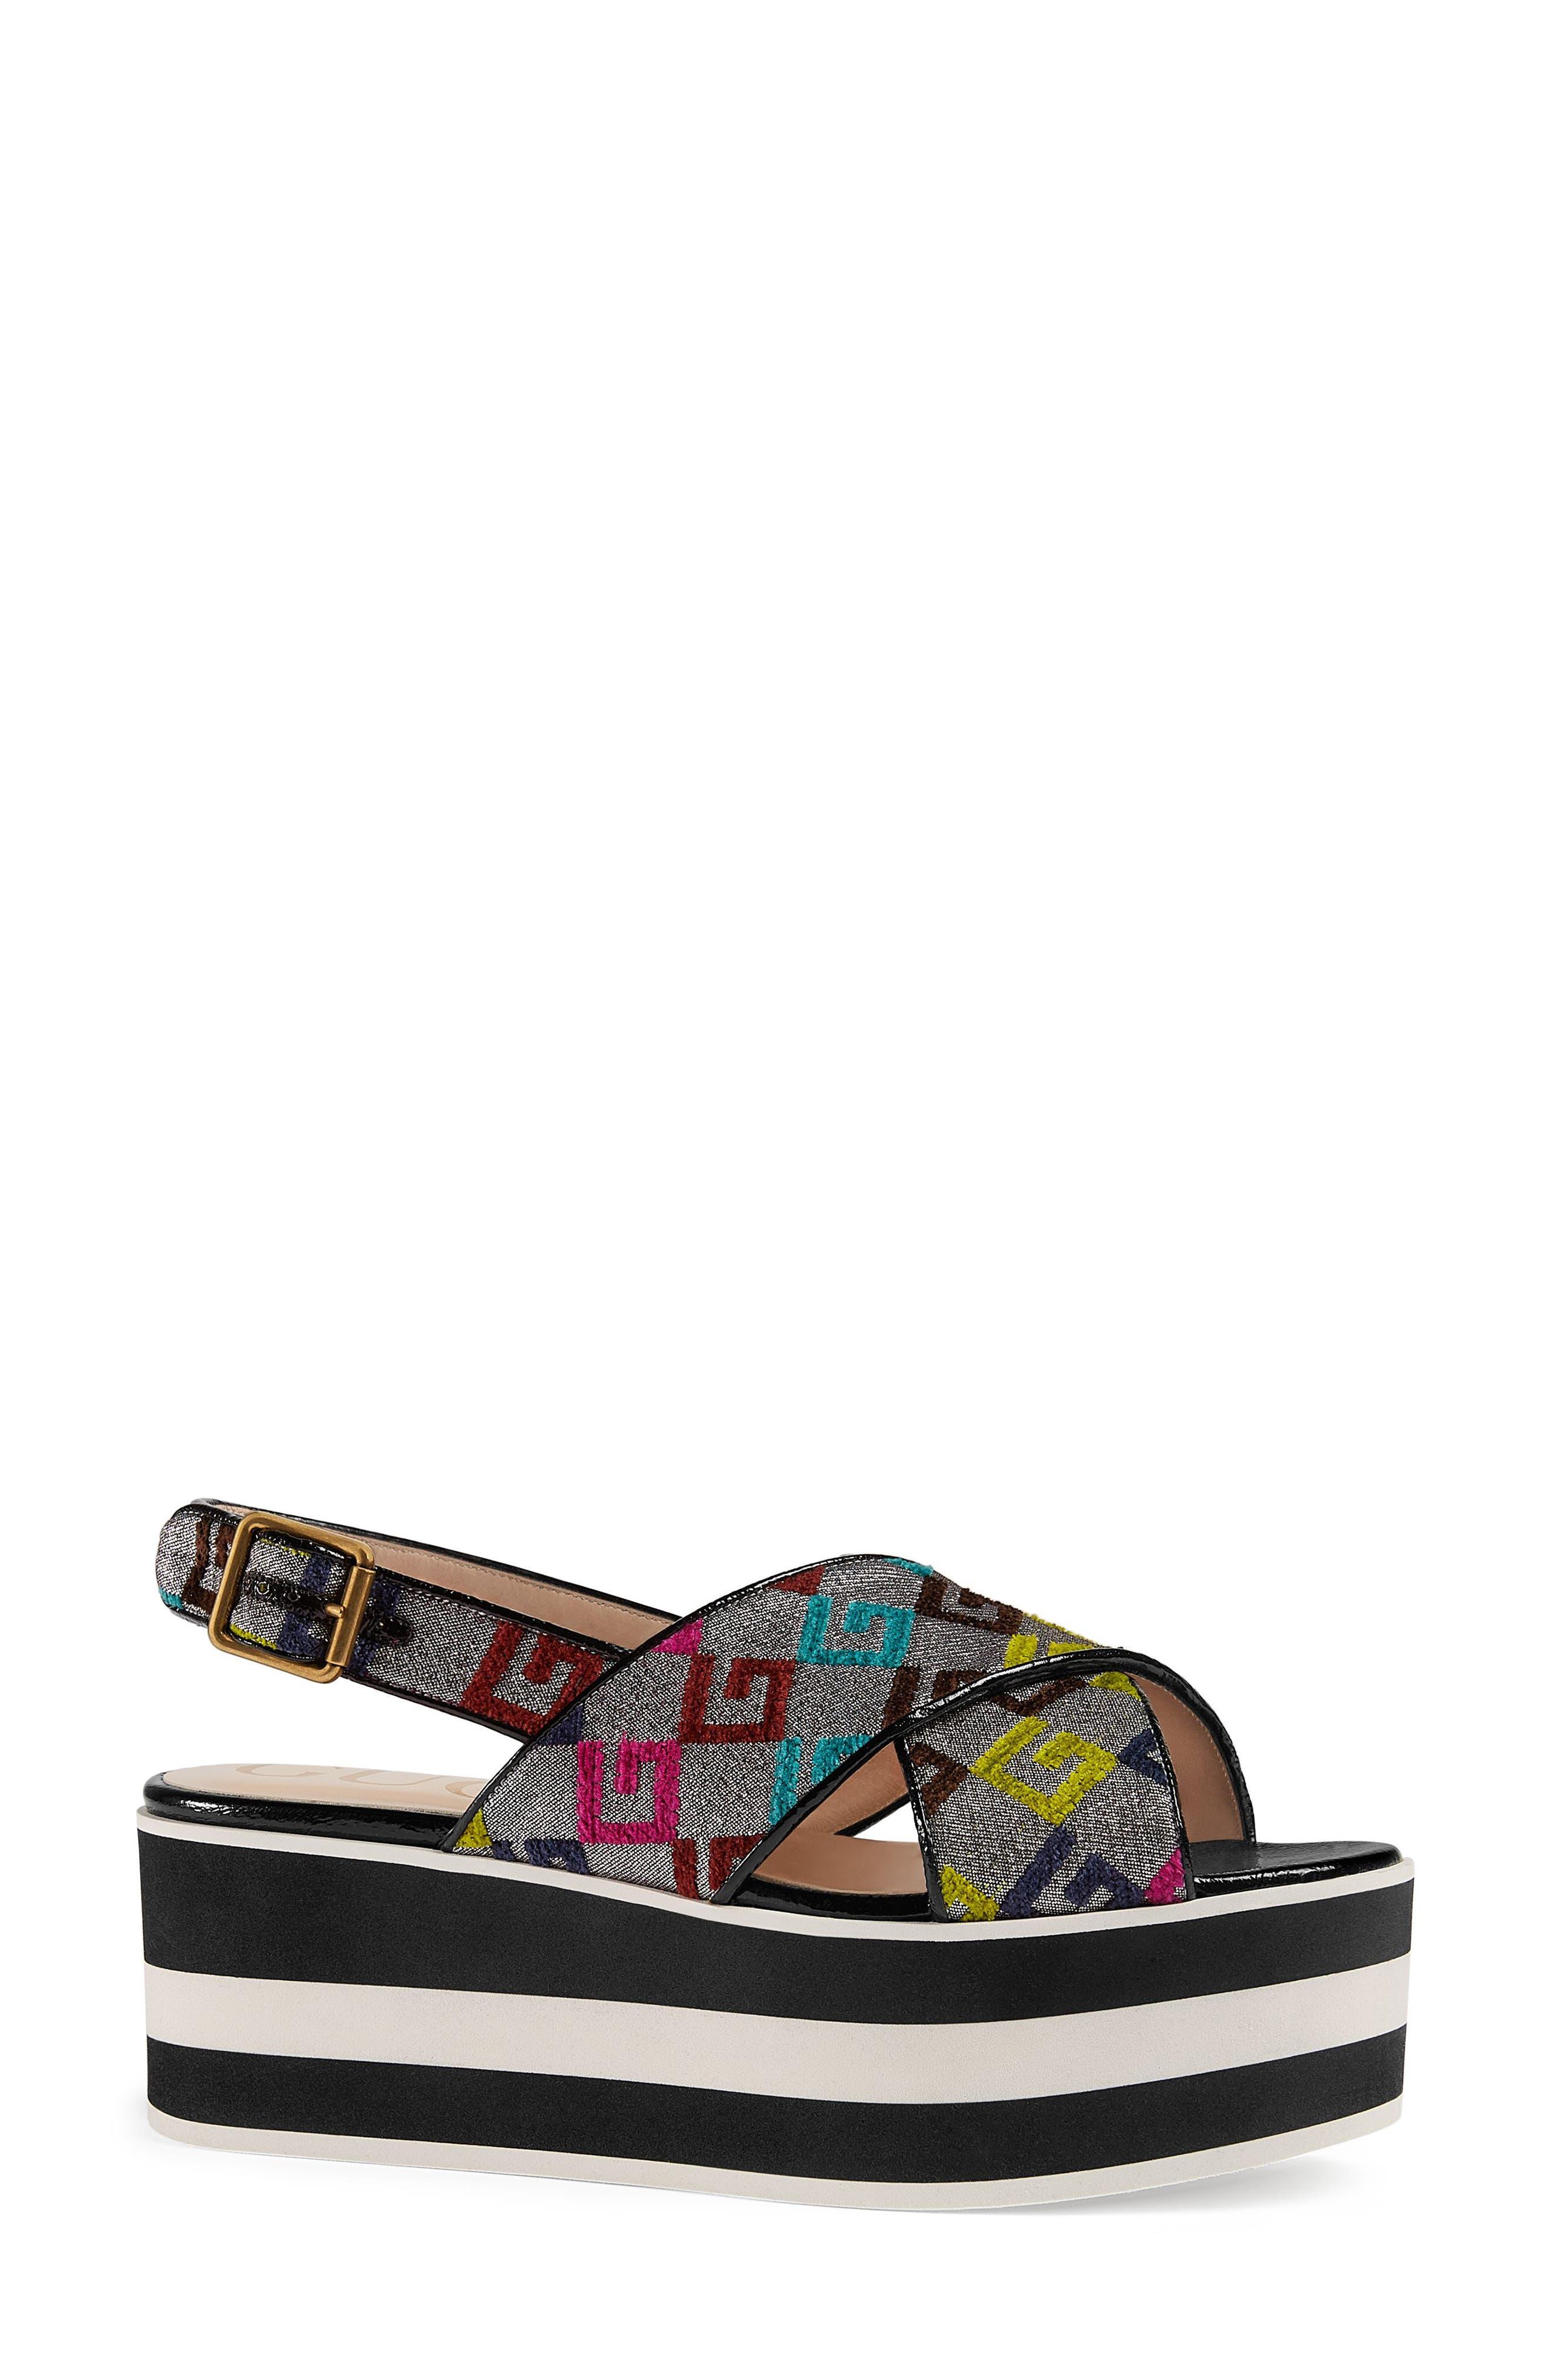 Gucci Peggy Flatform Sandal (Women)